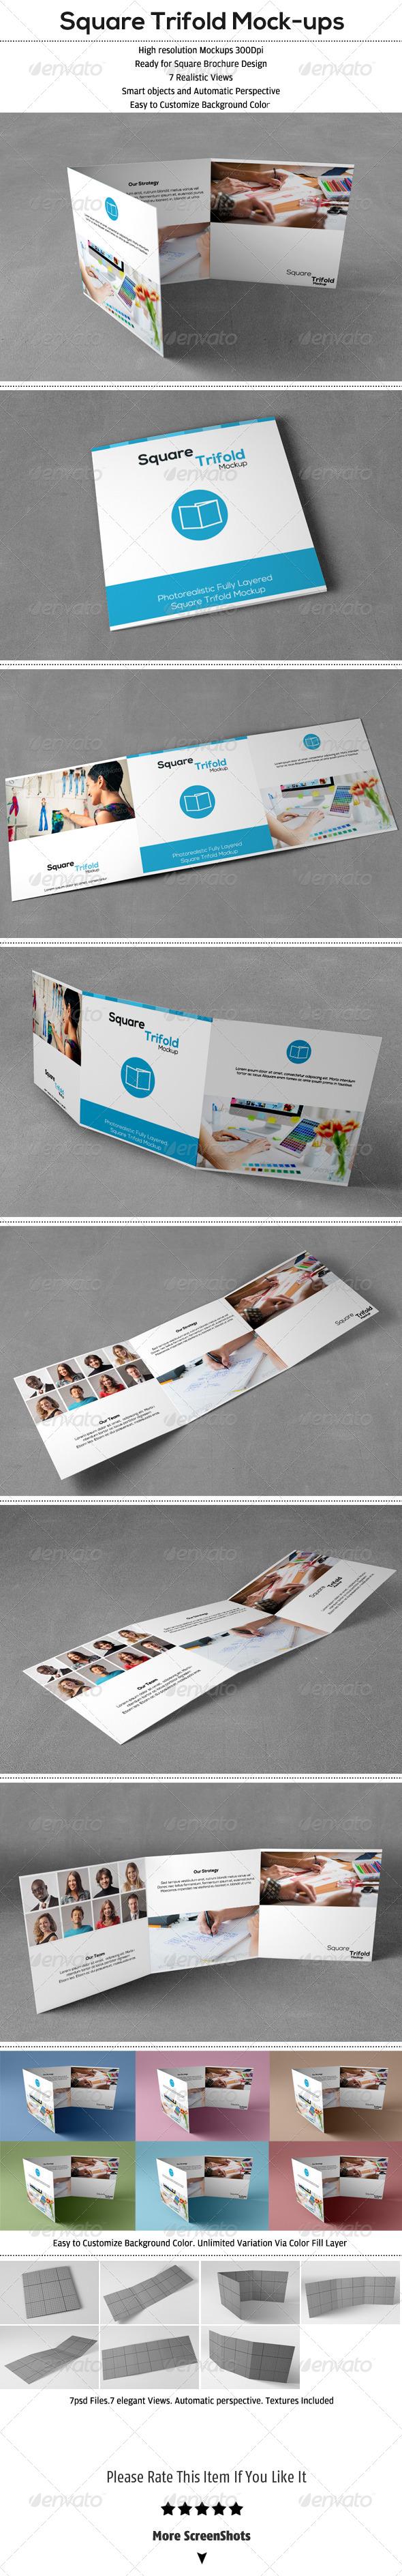 Square Trifold Mockup - Brochures Print